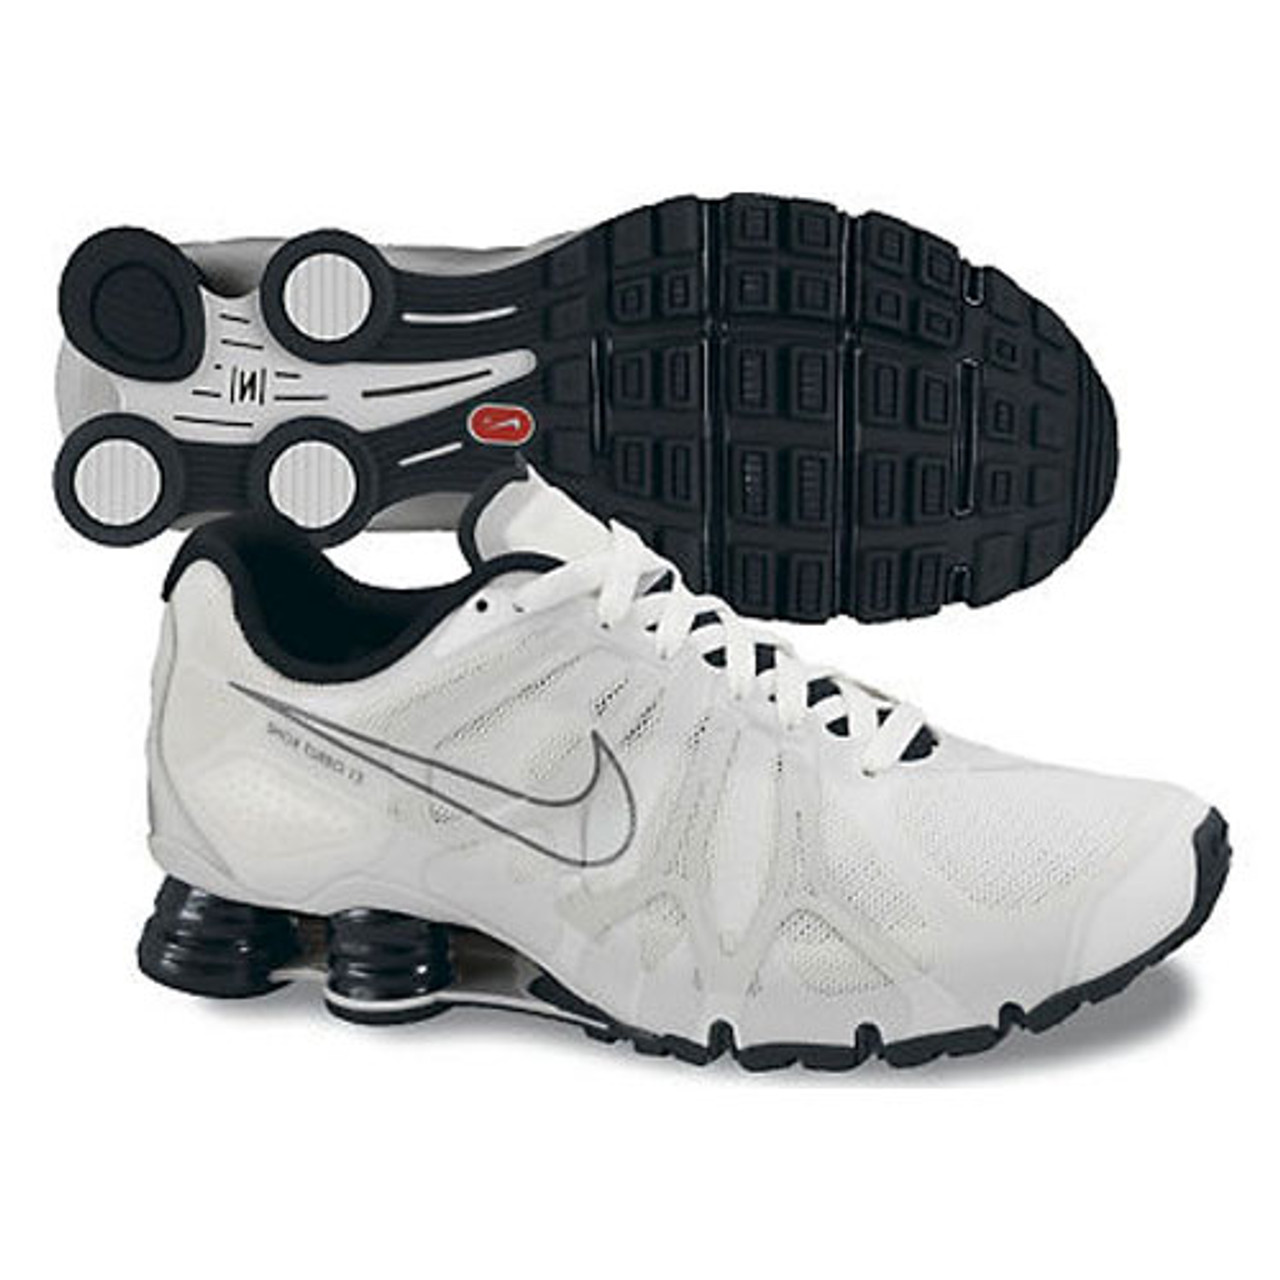 san francisco 52a4e 42495 Nike Shox Turbo + 13 White/Black